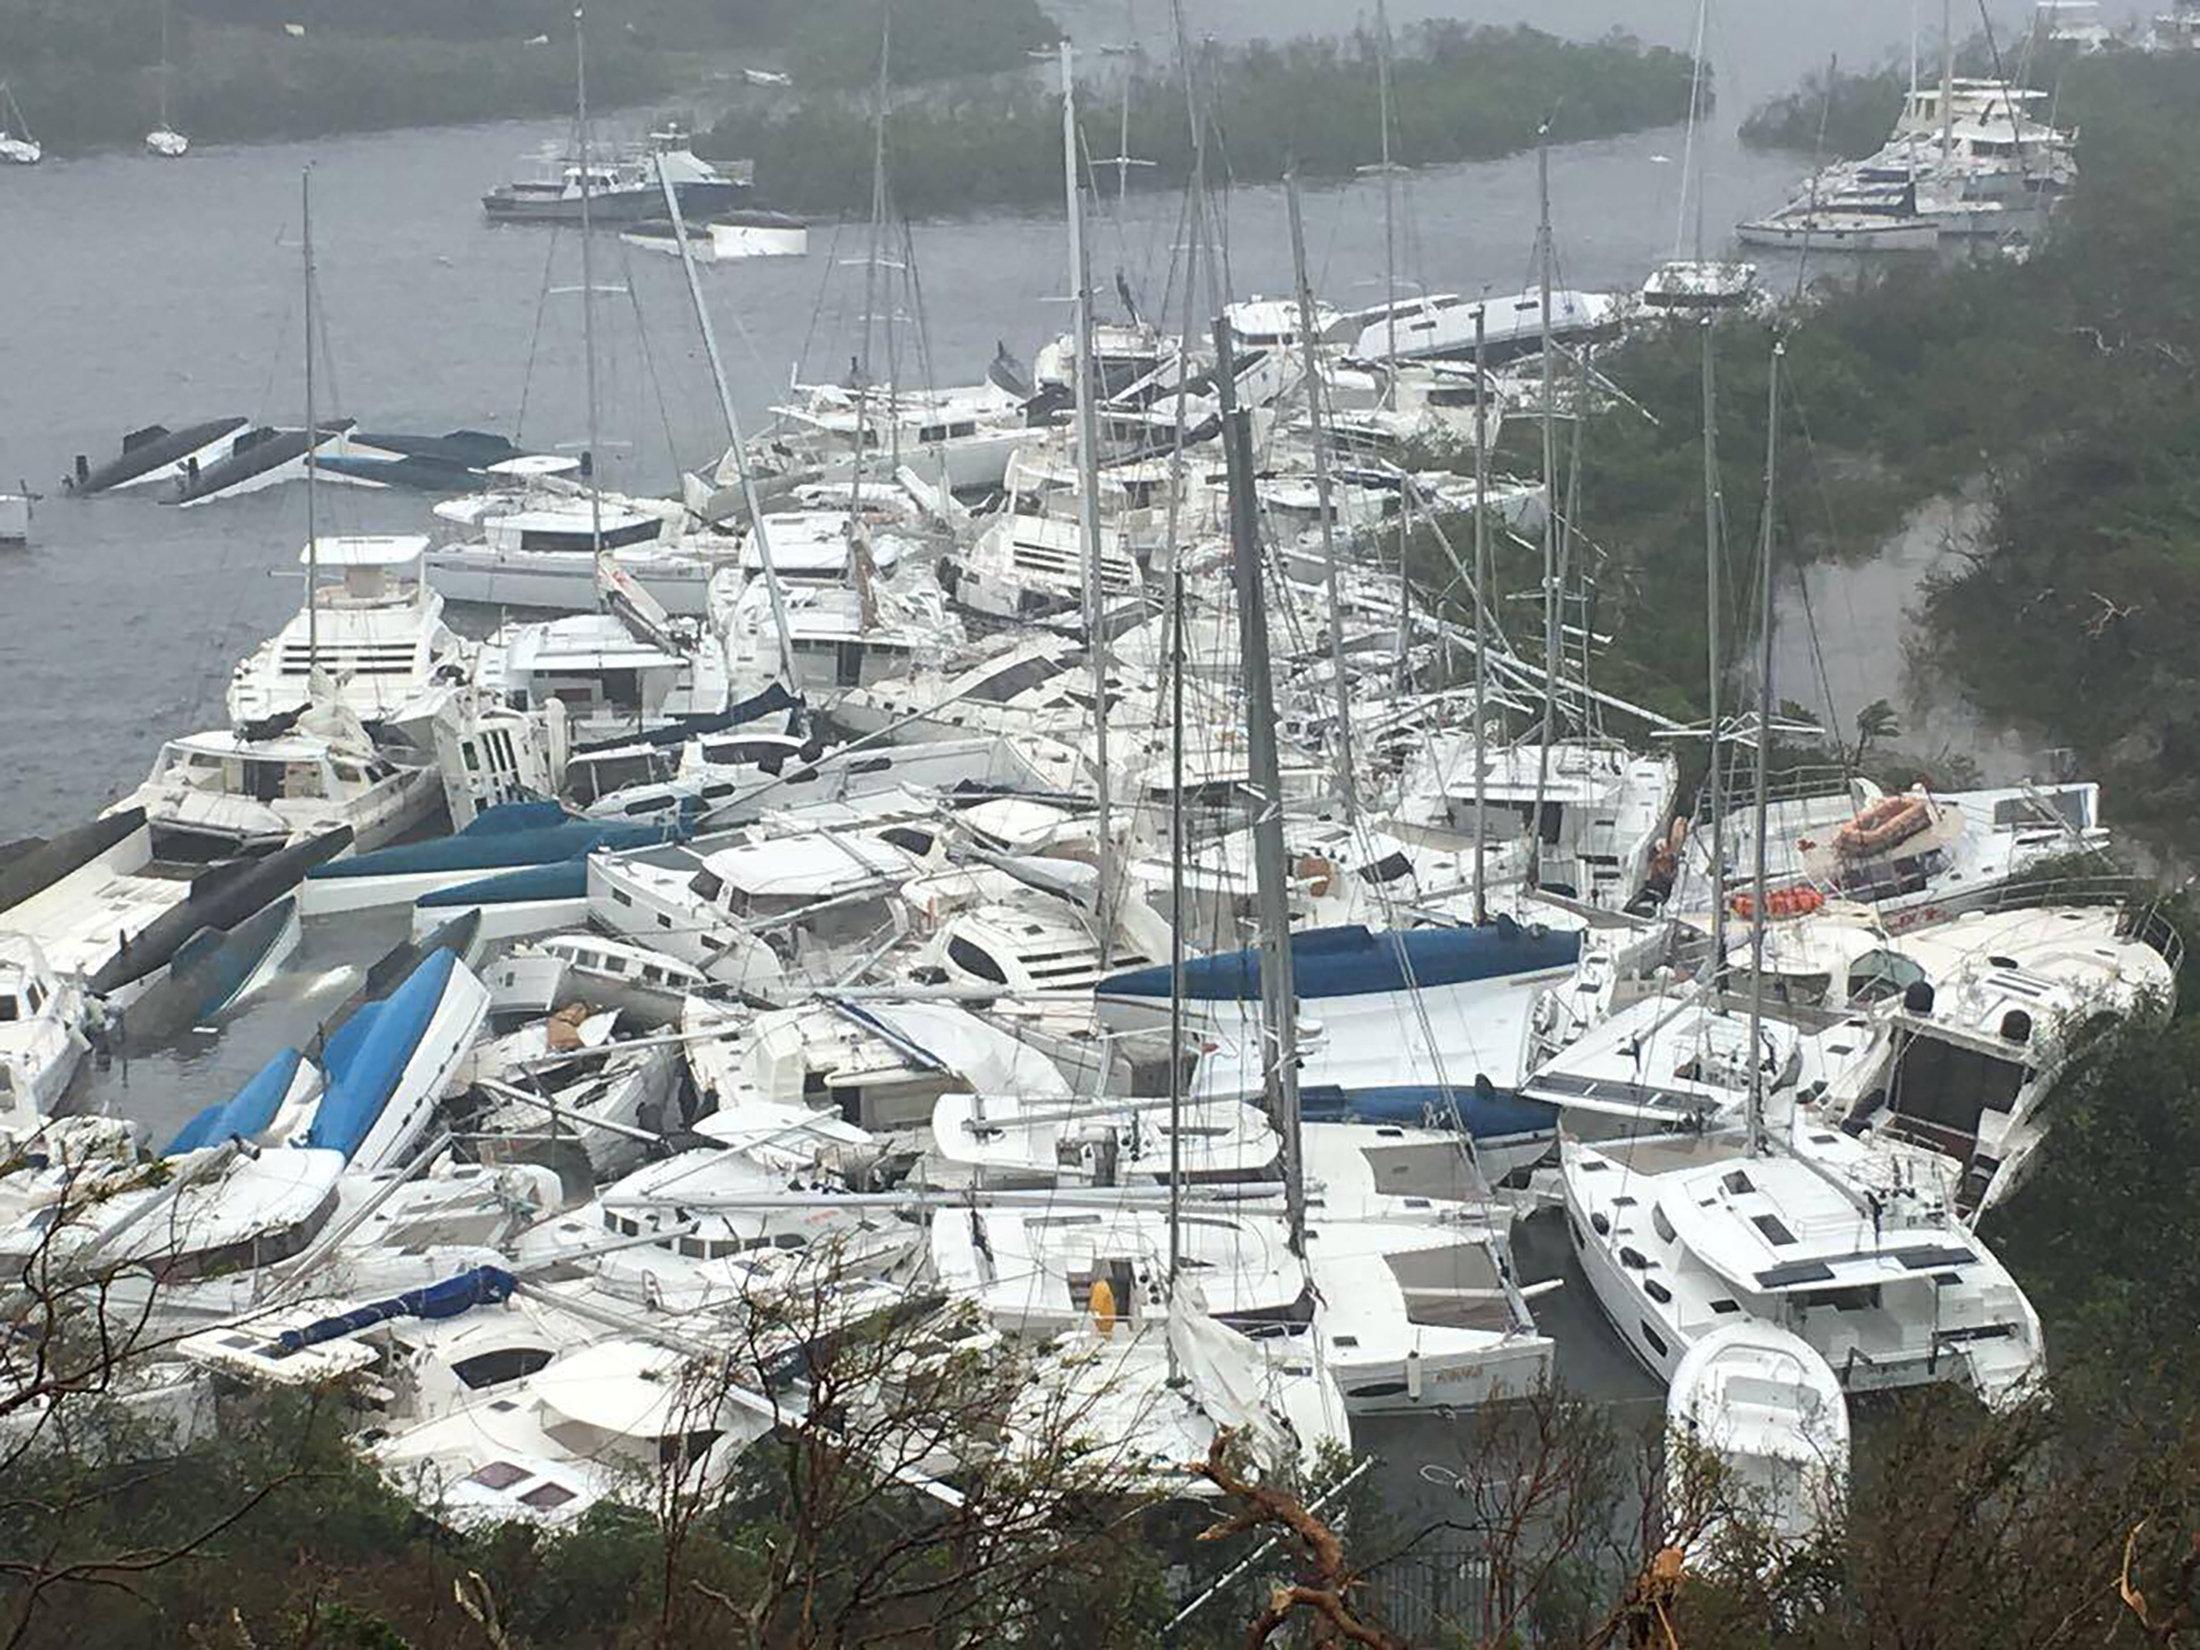 Pleasure craft lie crammed against the shore in Paraquita Bay, Tortola, British Virgin Islands.  Courtesy Ron Gurney/via REUTERS